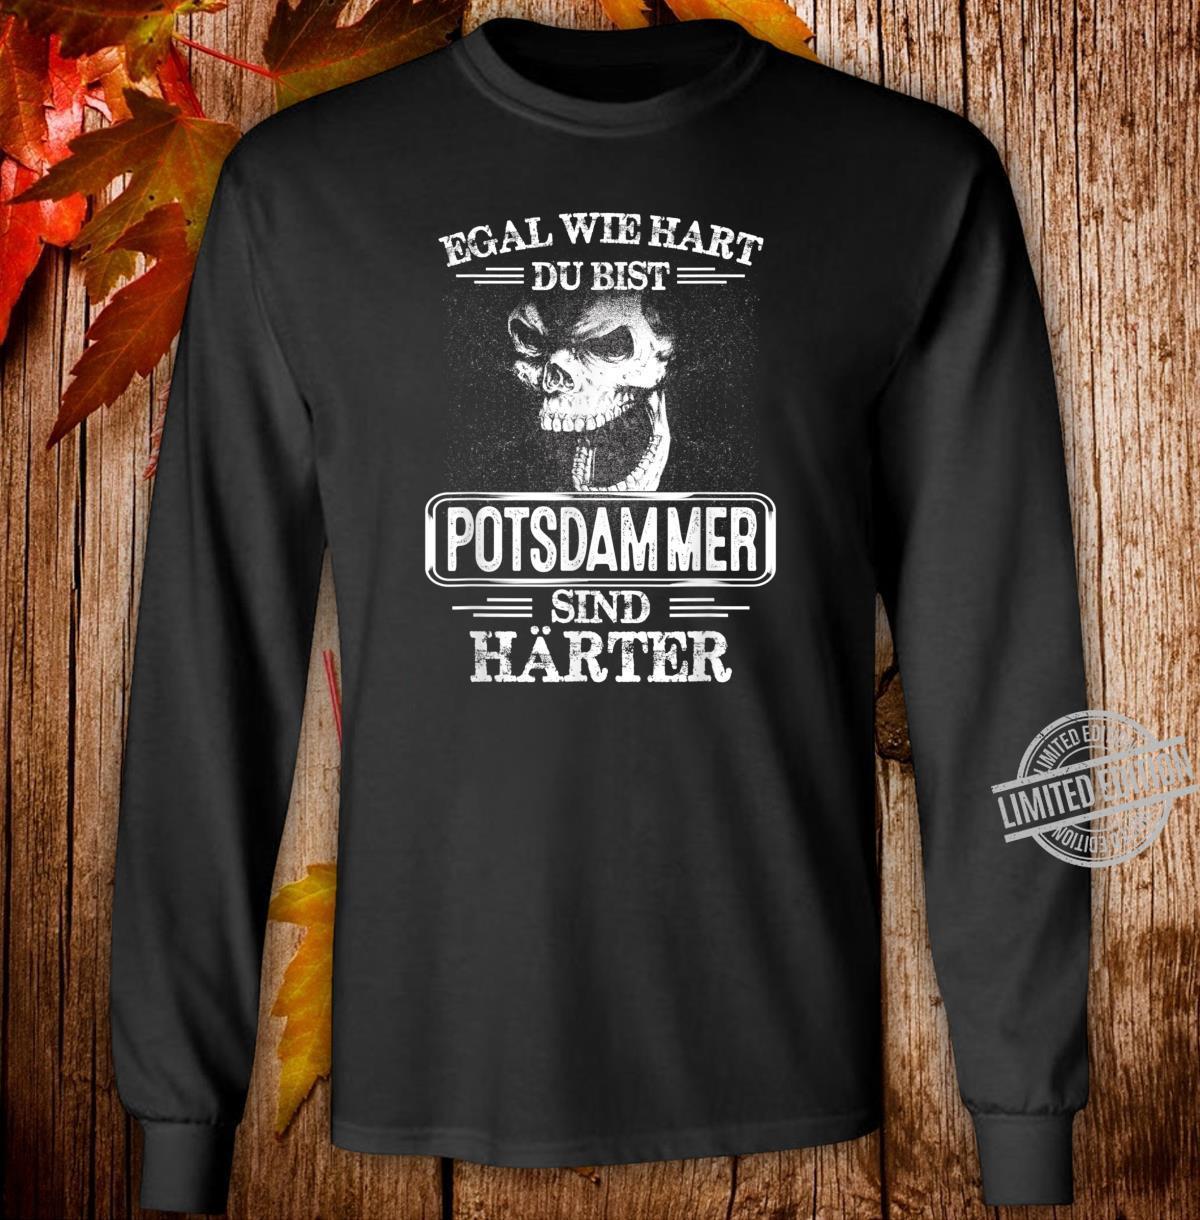 Potsdammer sind härter Städte Kleidung Stadt Potsdamm Shirt long sleeved